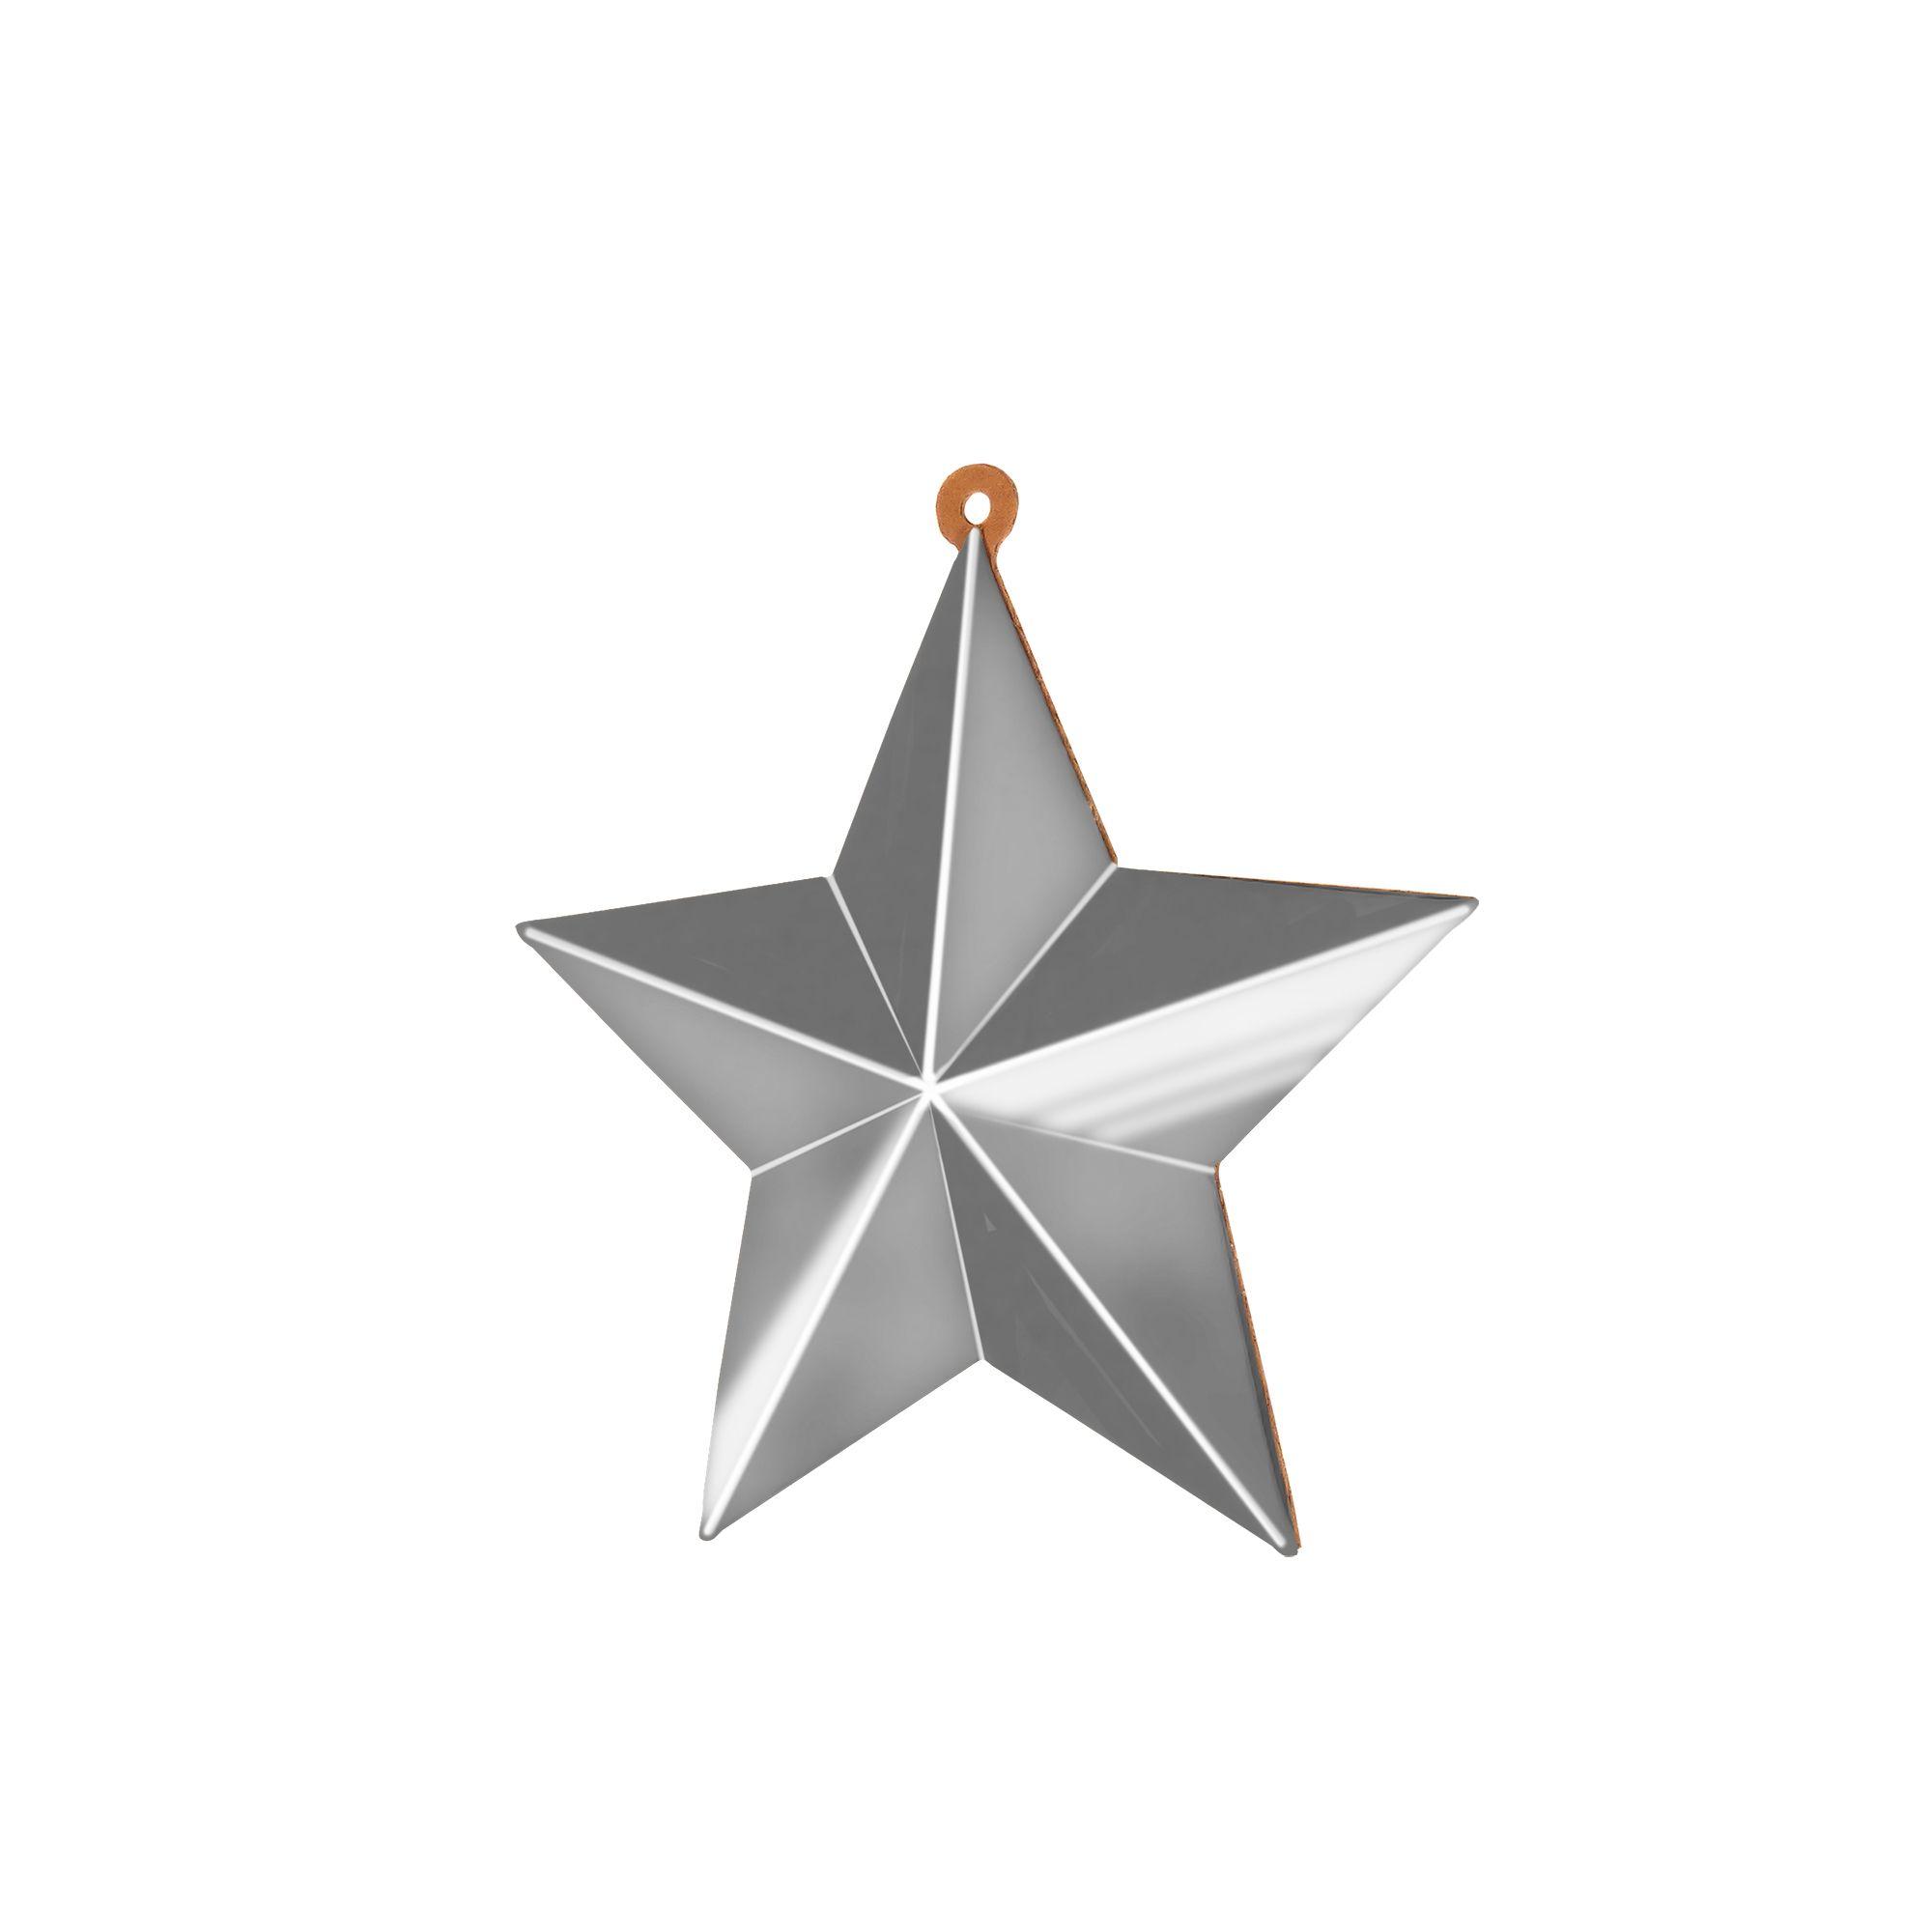 Stella Di Natale Tridimensionale.Stella Di Natale 3d M A003116 Cardboard Christmas Star